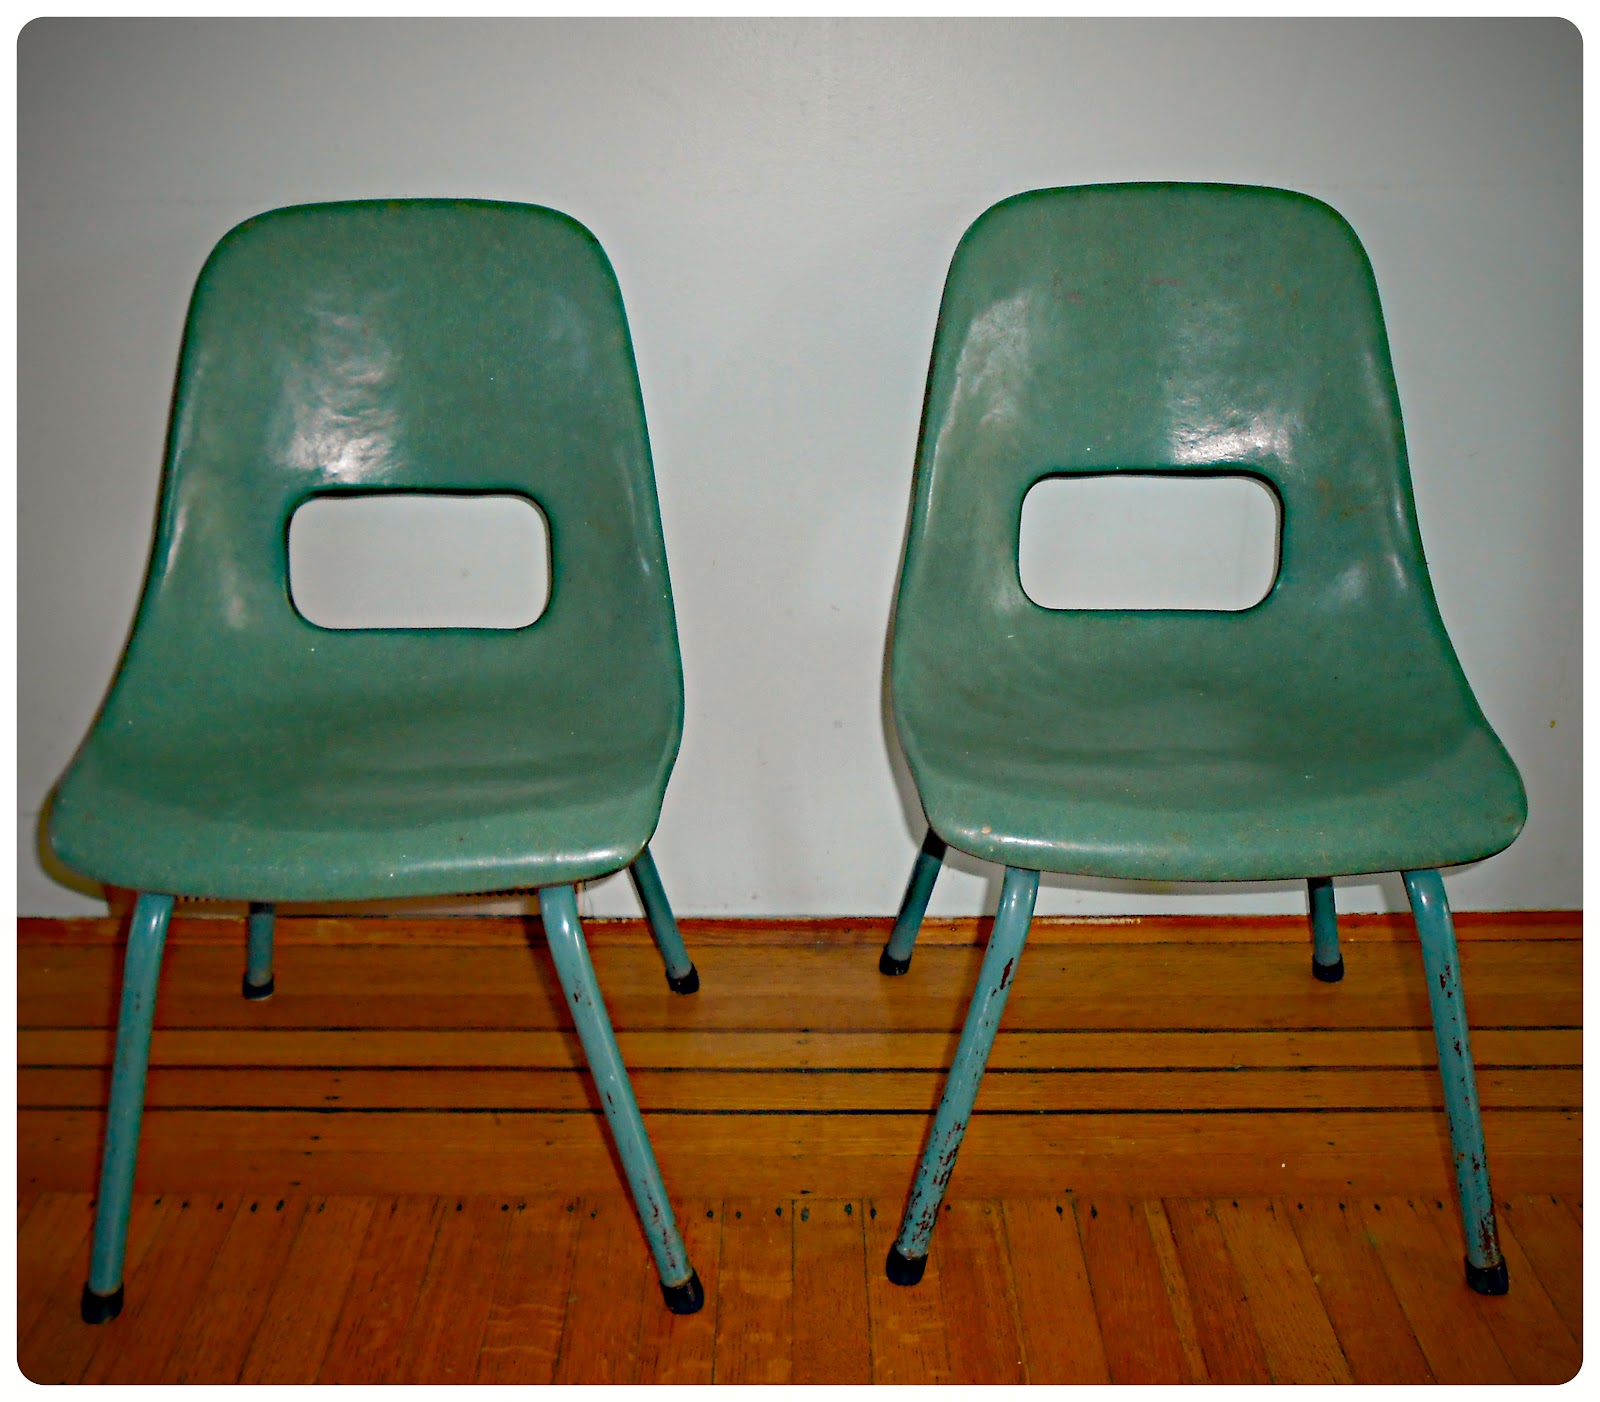 ■garage design Perkiness Garage Chairs Garage Chairs Stool The